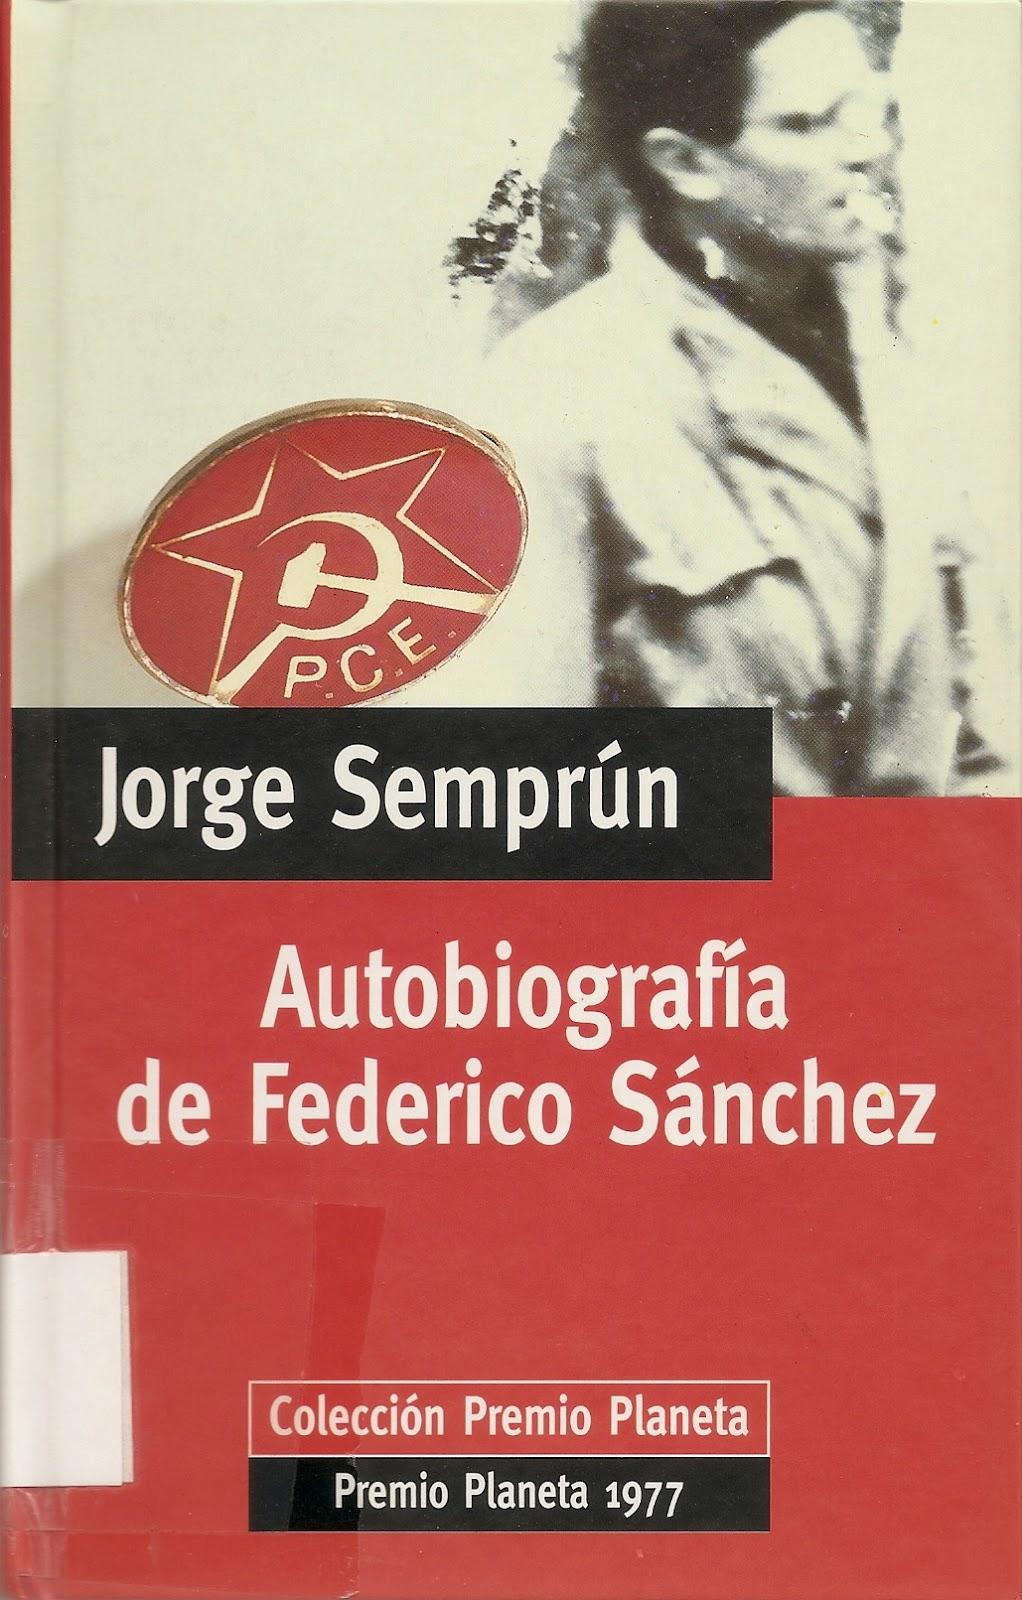 autobiographia_de_federico_sanchez.jpg